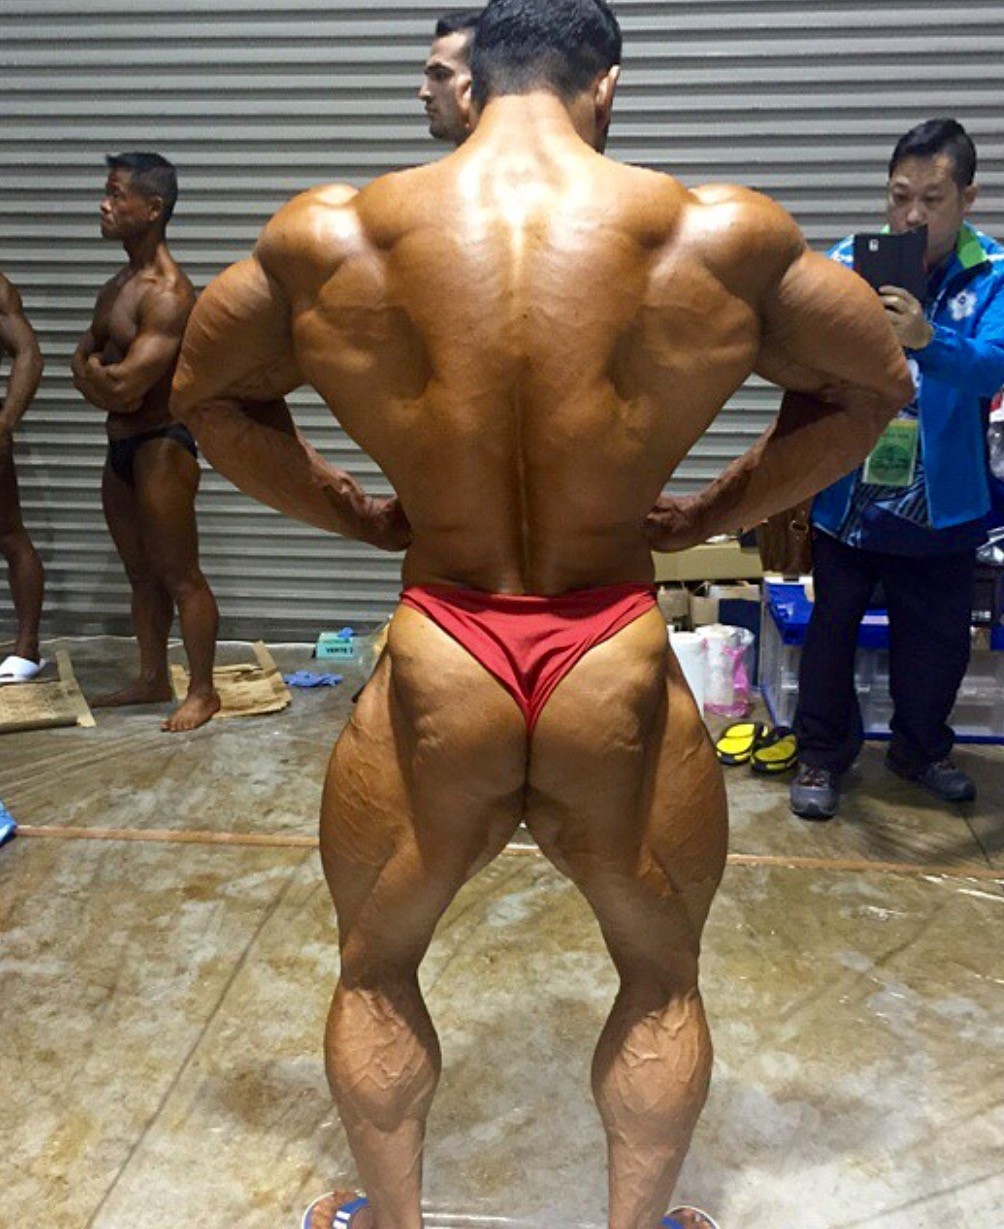 Muscle Ammiratore: IFBB IRANIAN BODYBUILDER AYAT BAGHERI